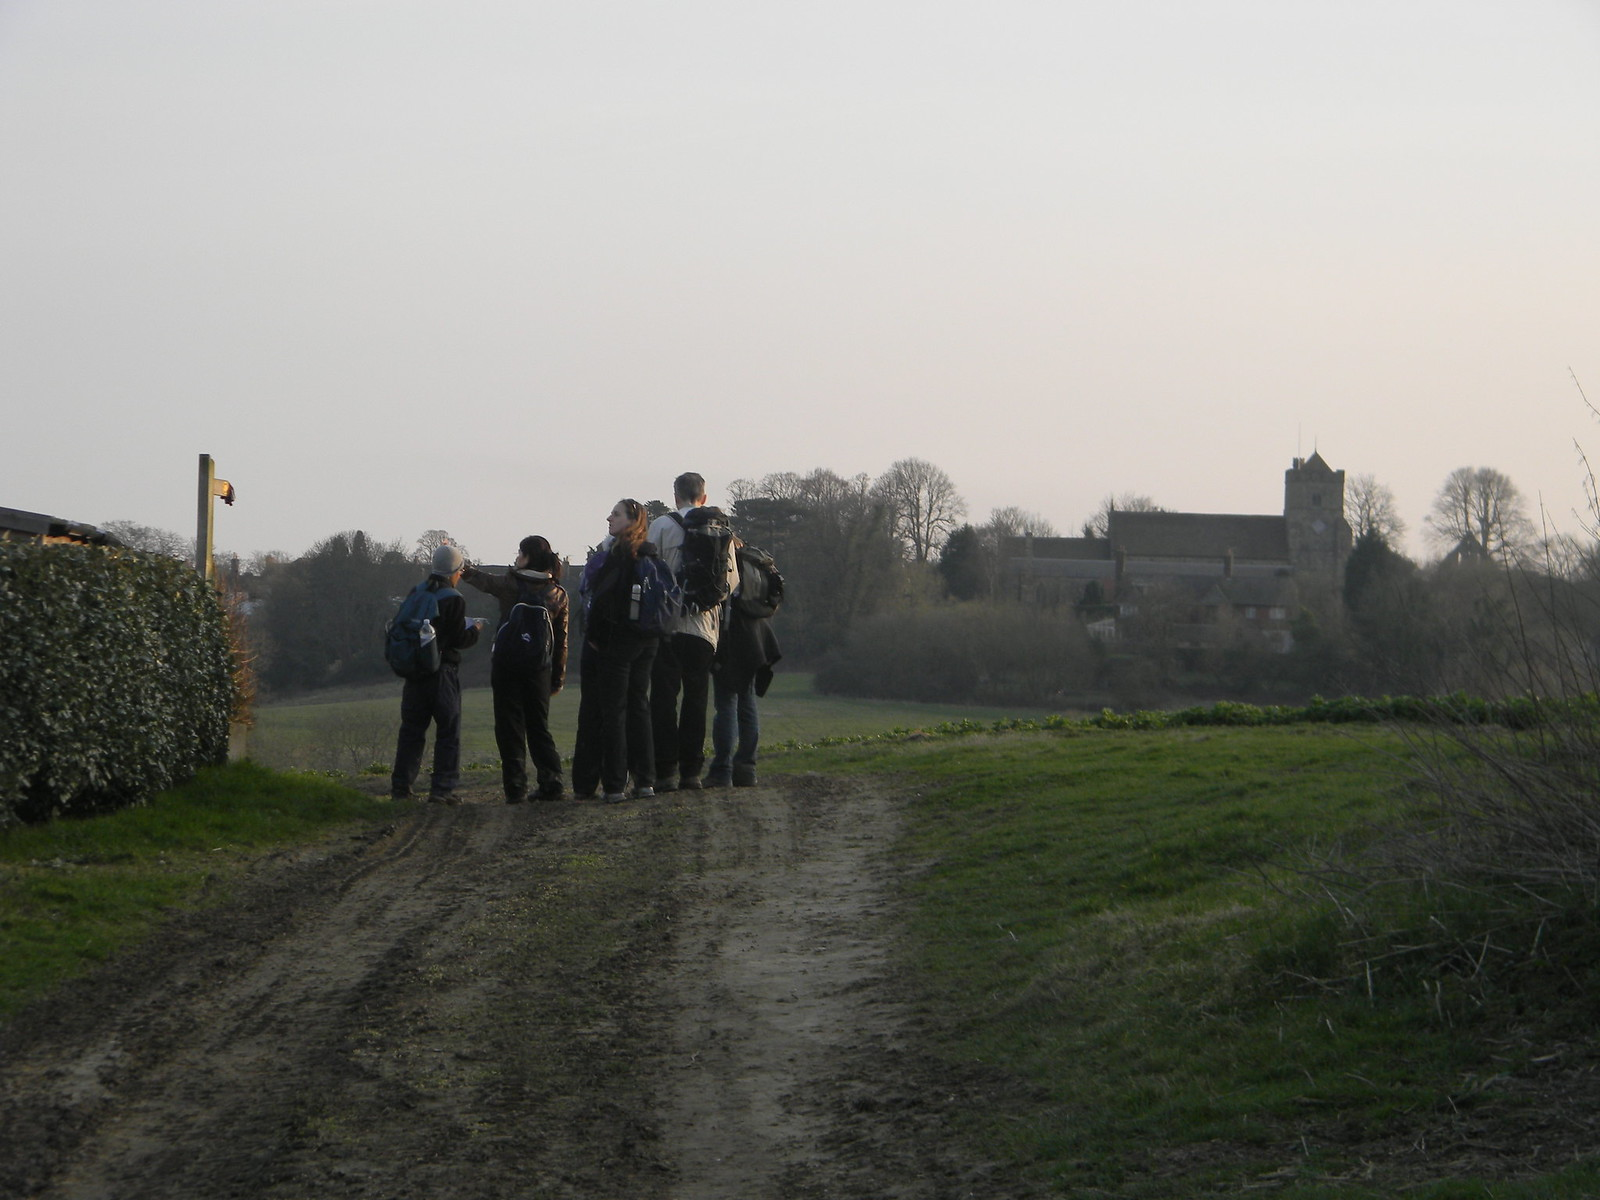 Route discussion Robertsbridge to Battle